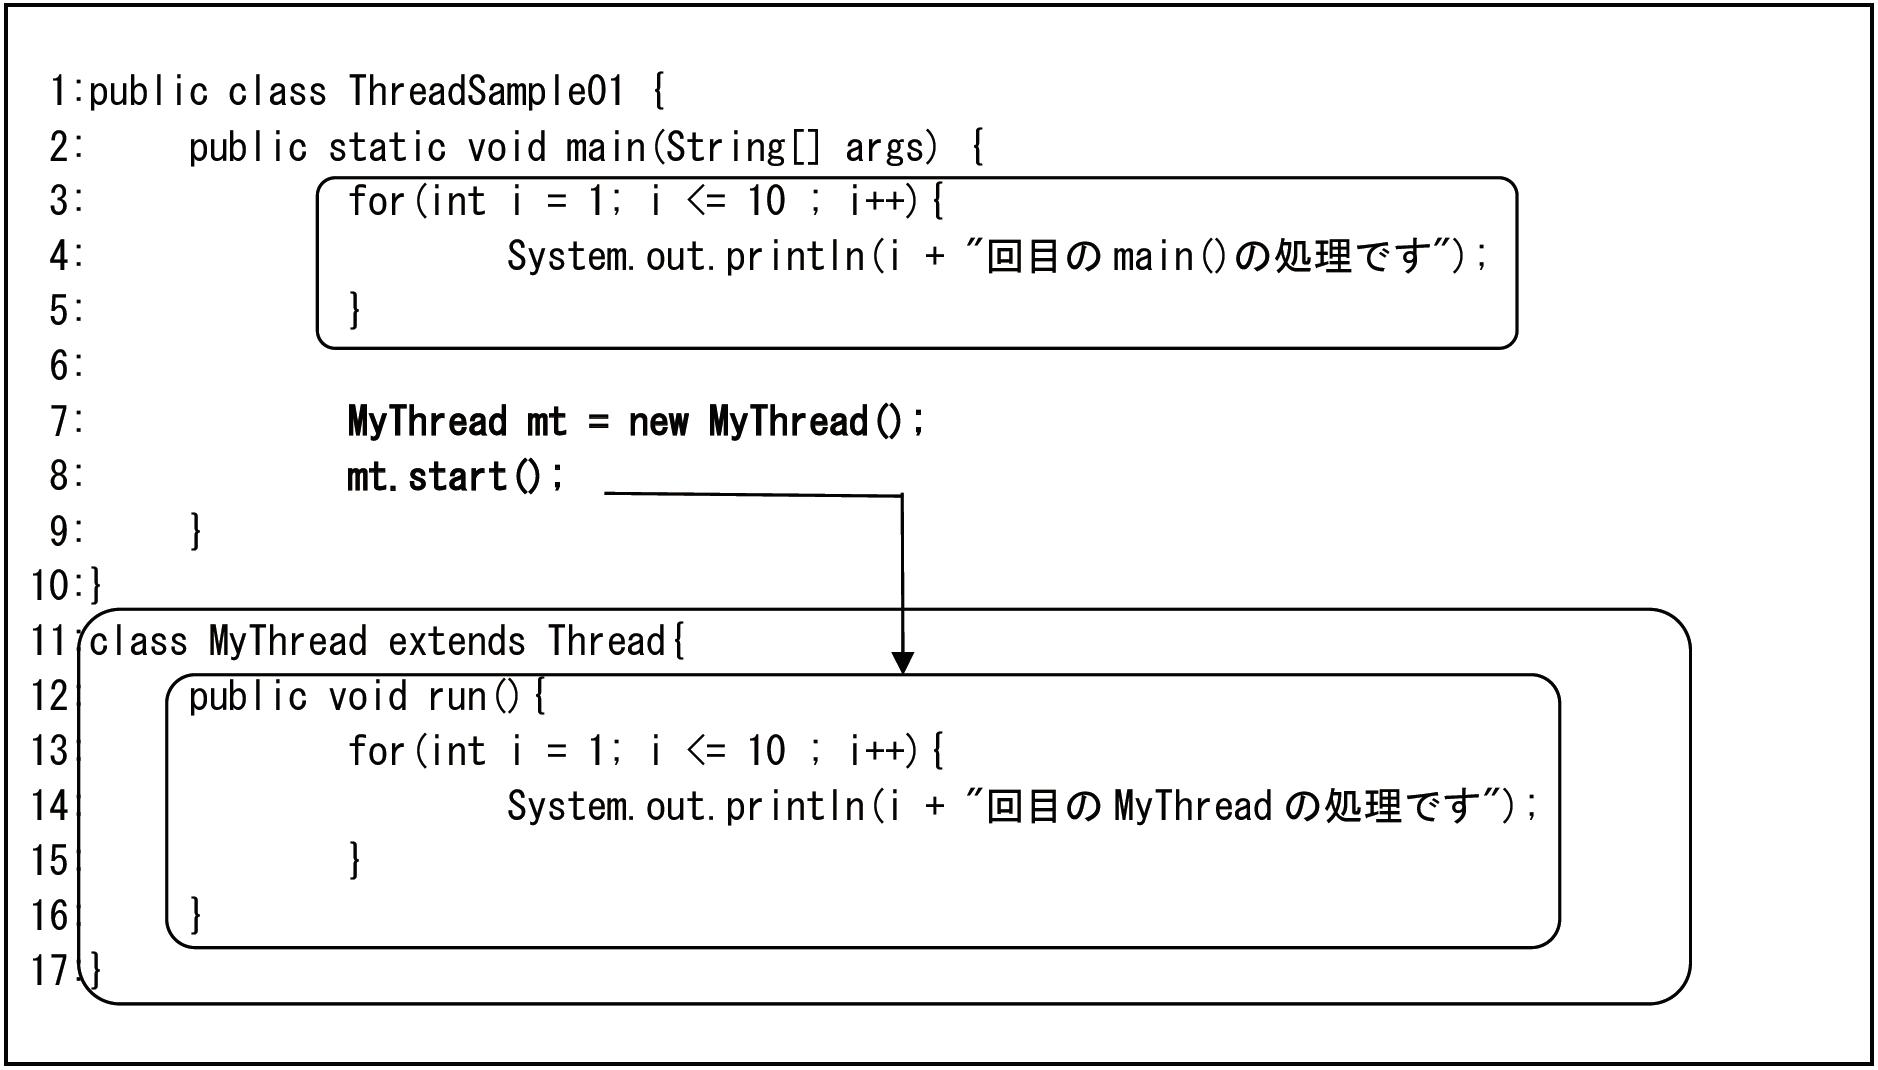 ThreadSample01